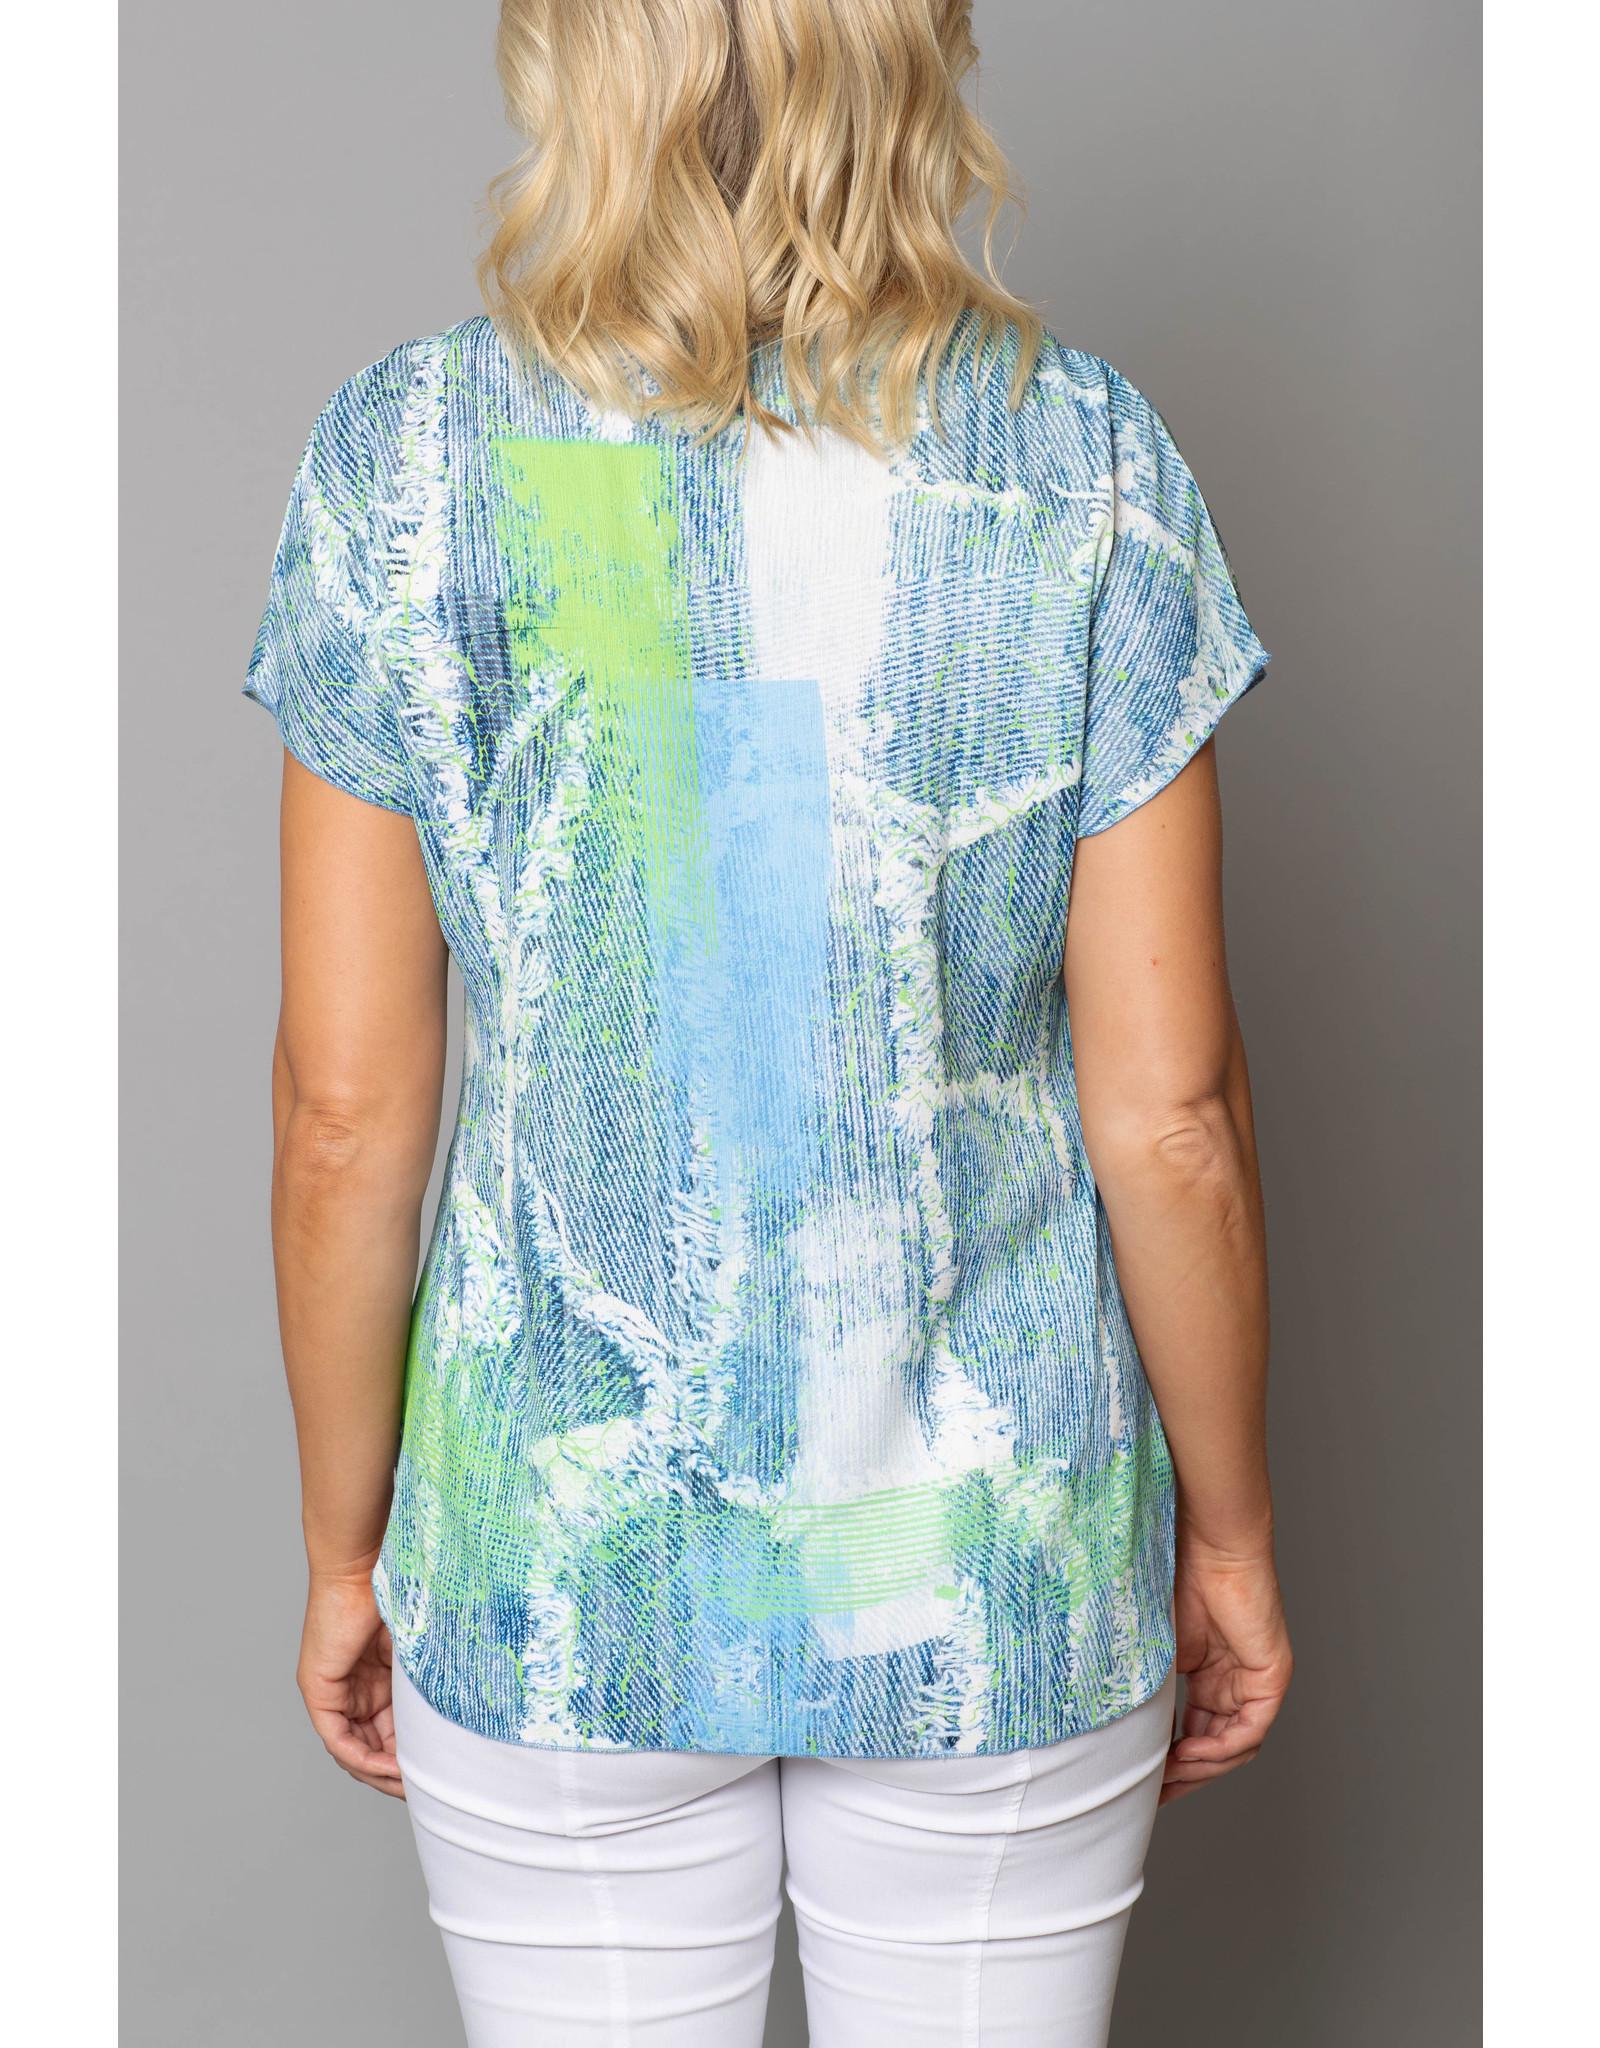 Peruzzi  Abstract  short sleeve Print Top